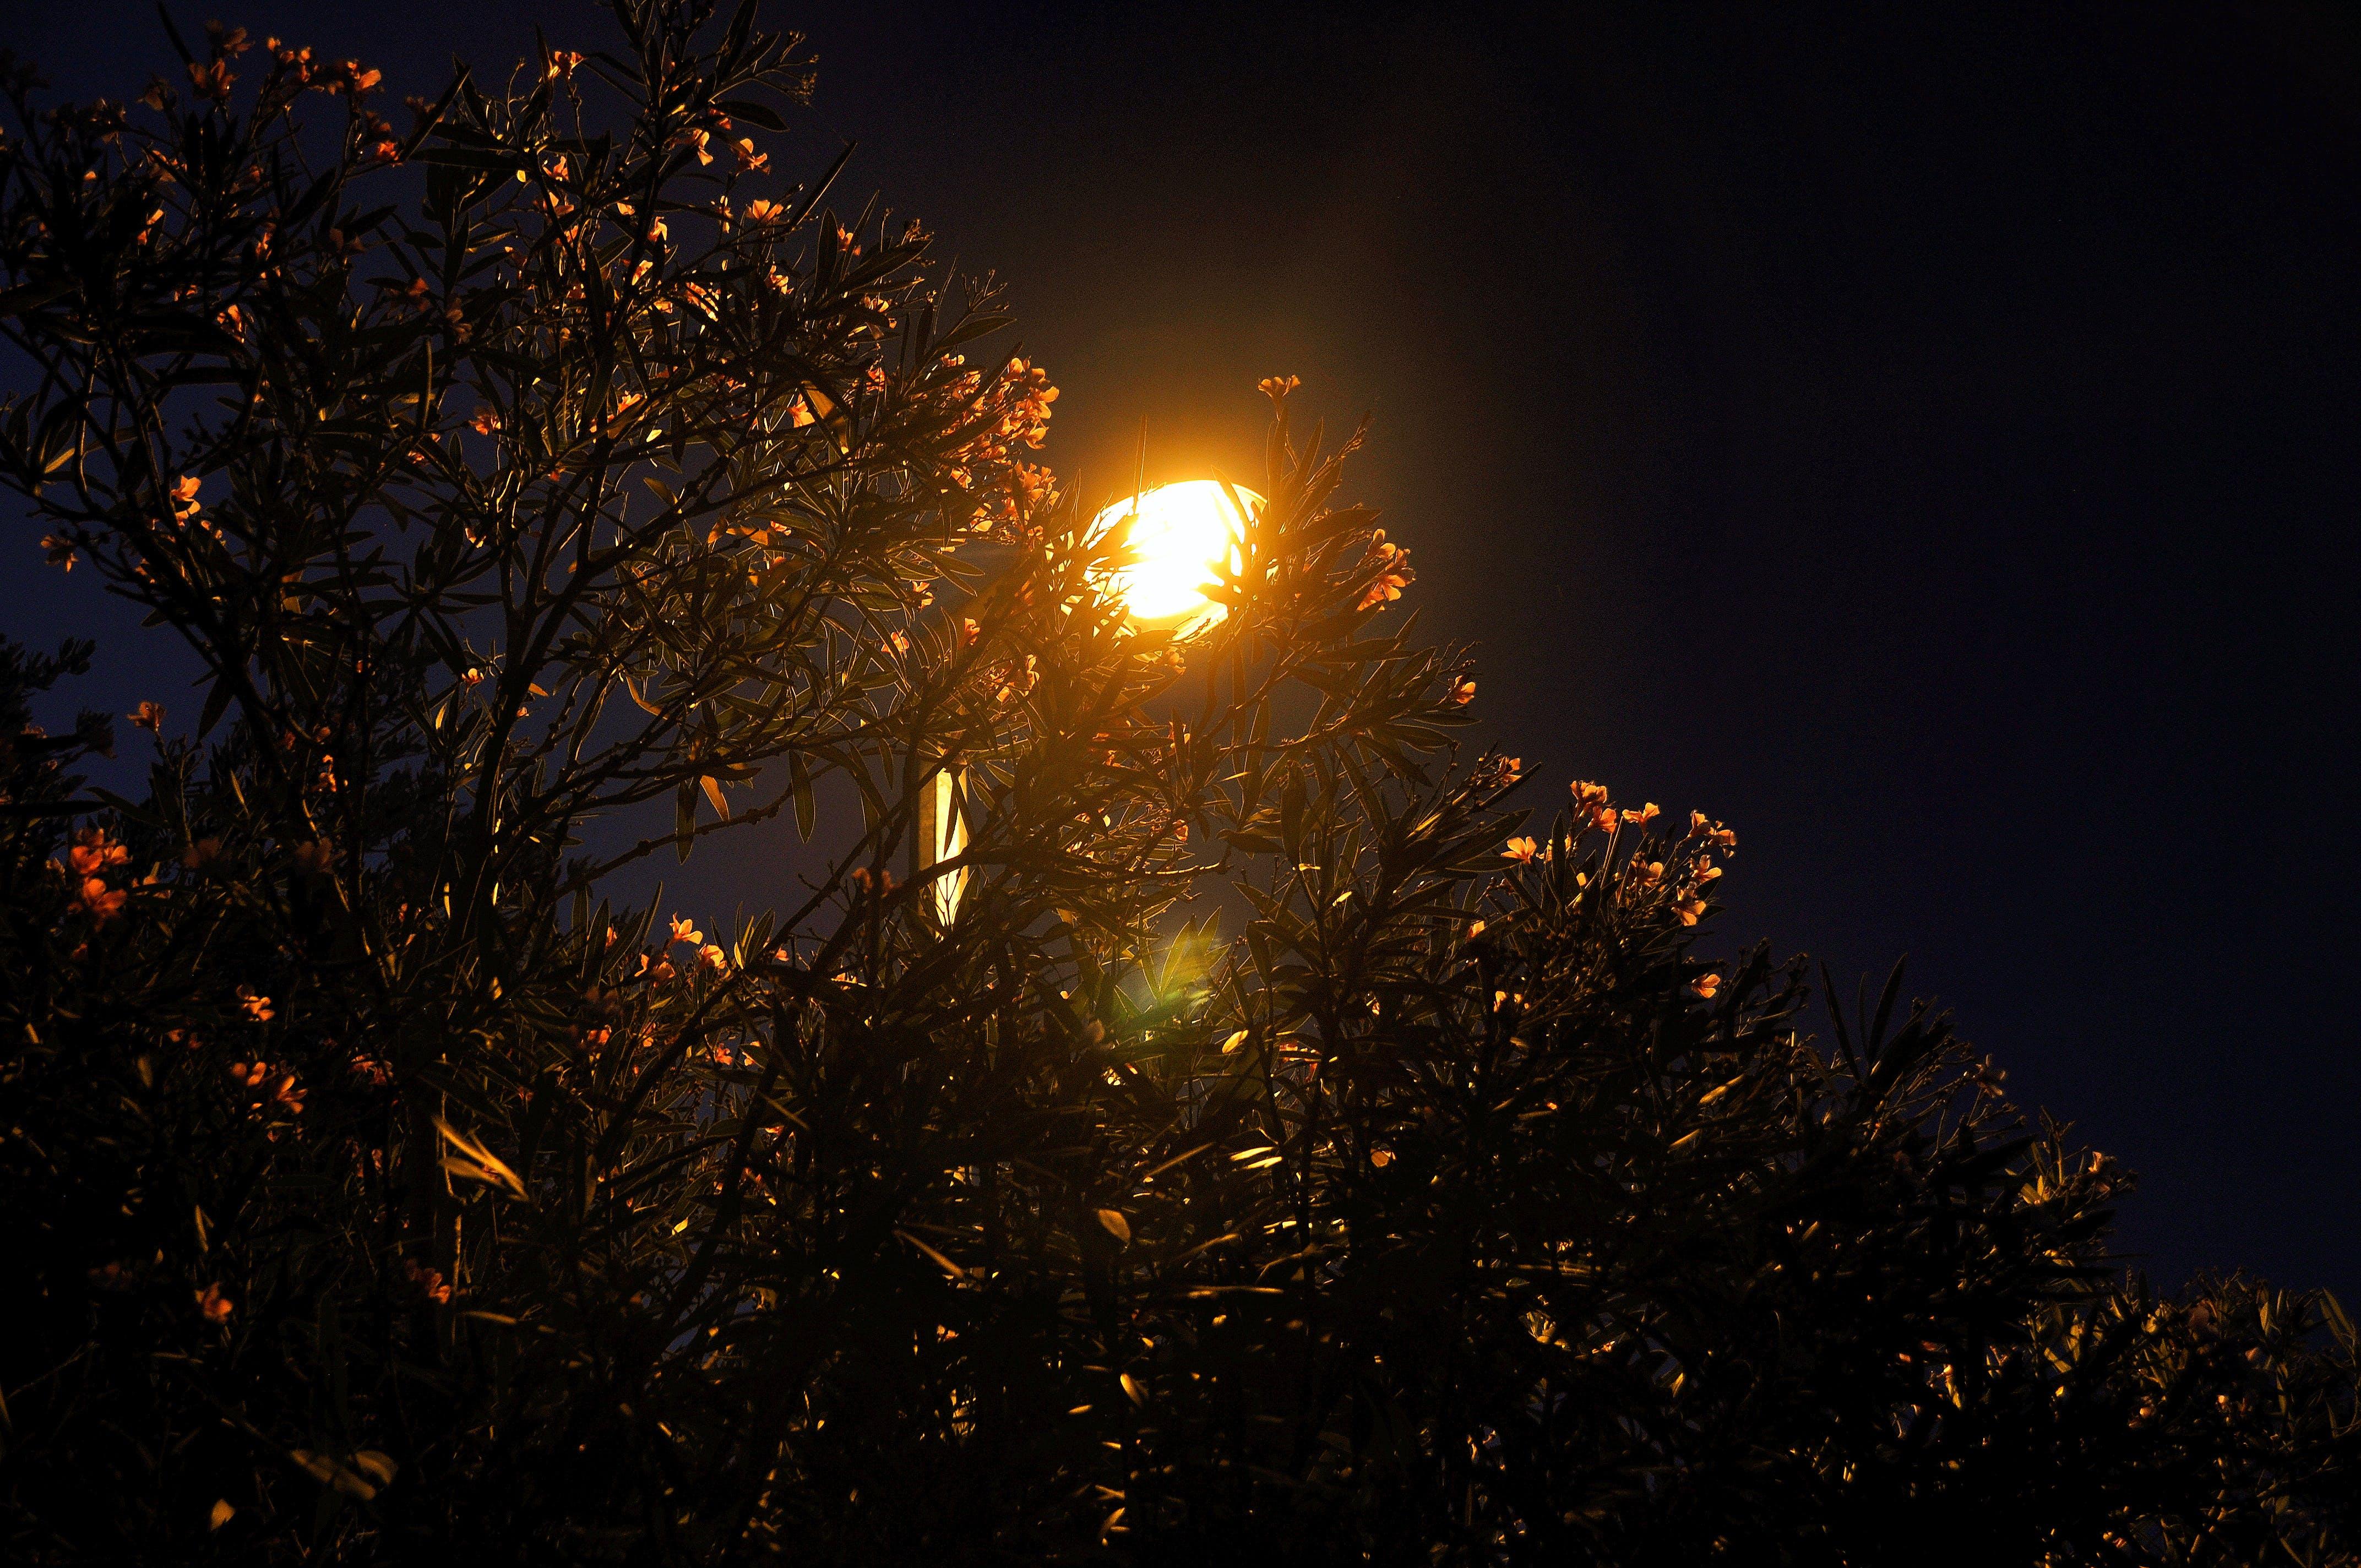 Fotos de stock gratuitas de árbol, lámpara, Luces de noche